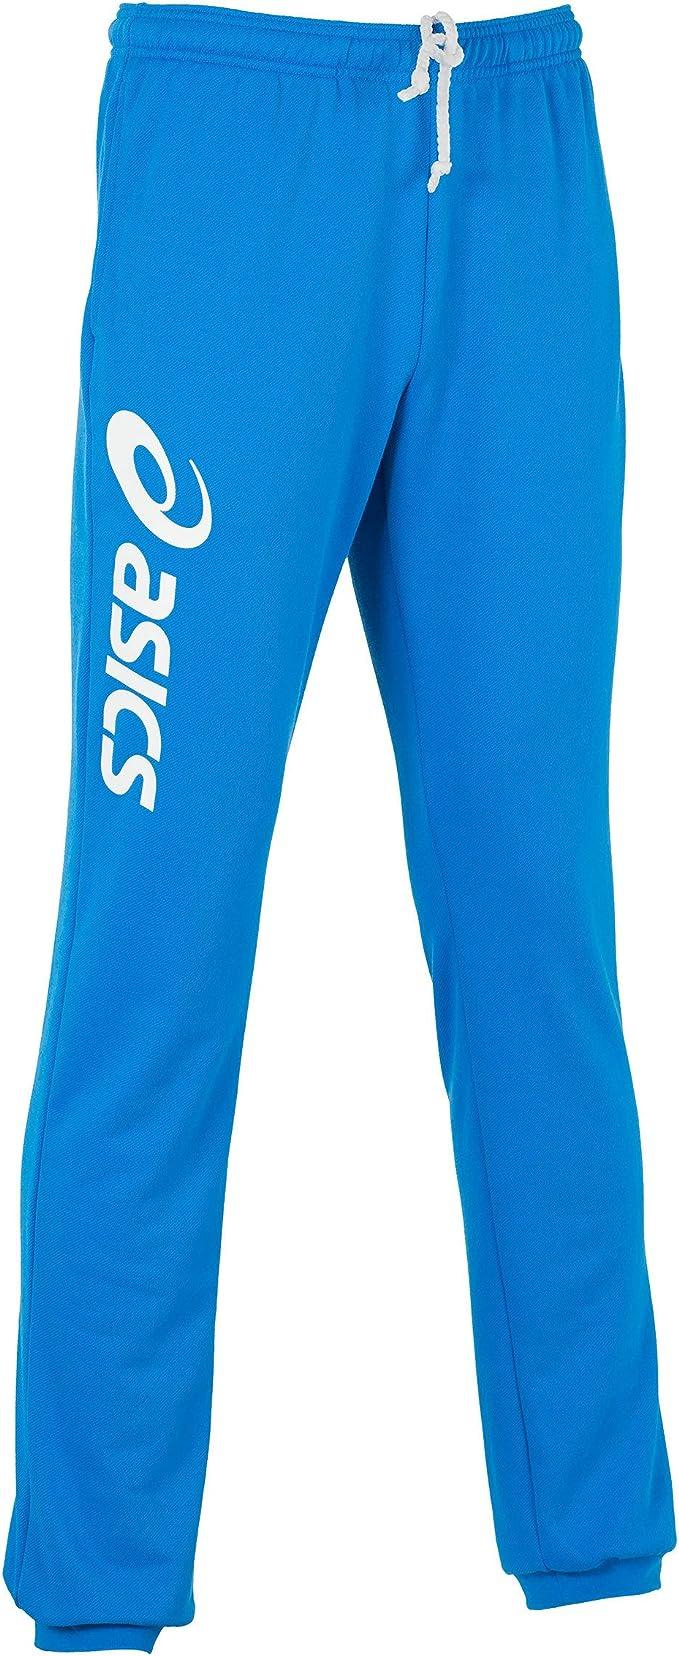 ASICS Sigma-Pantalon : Amazon.fr